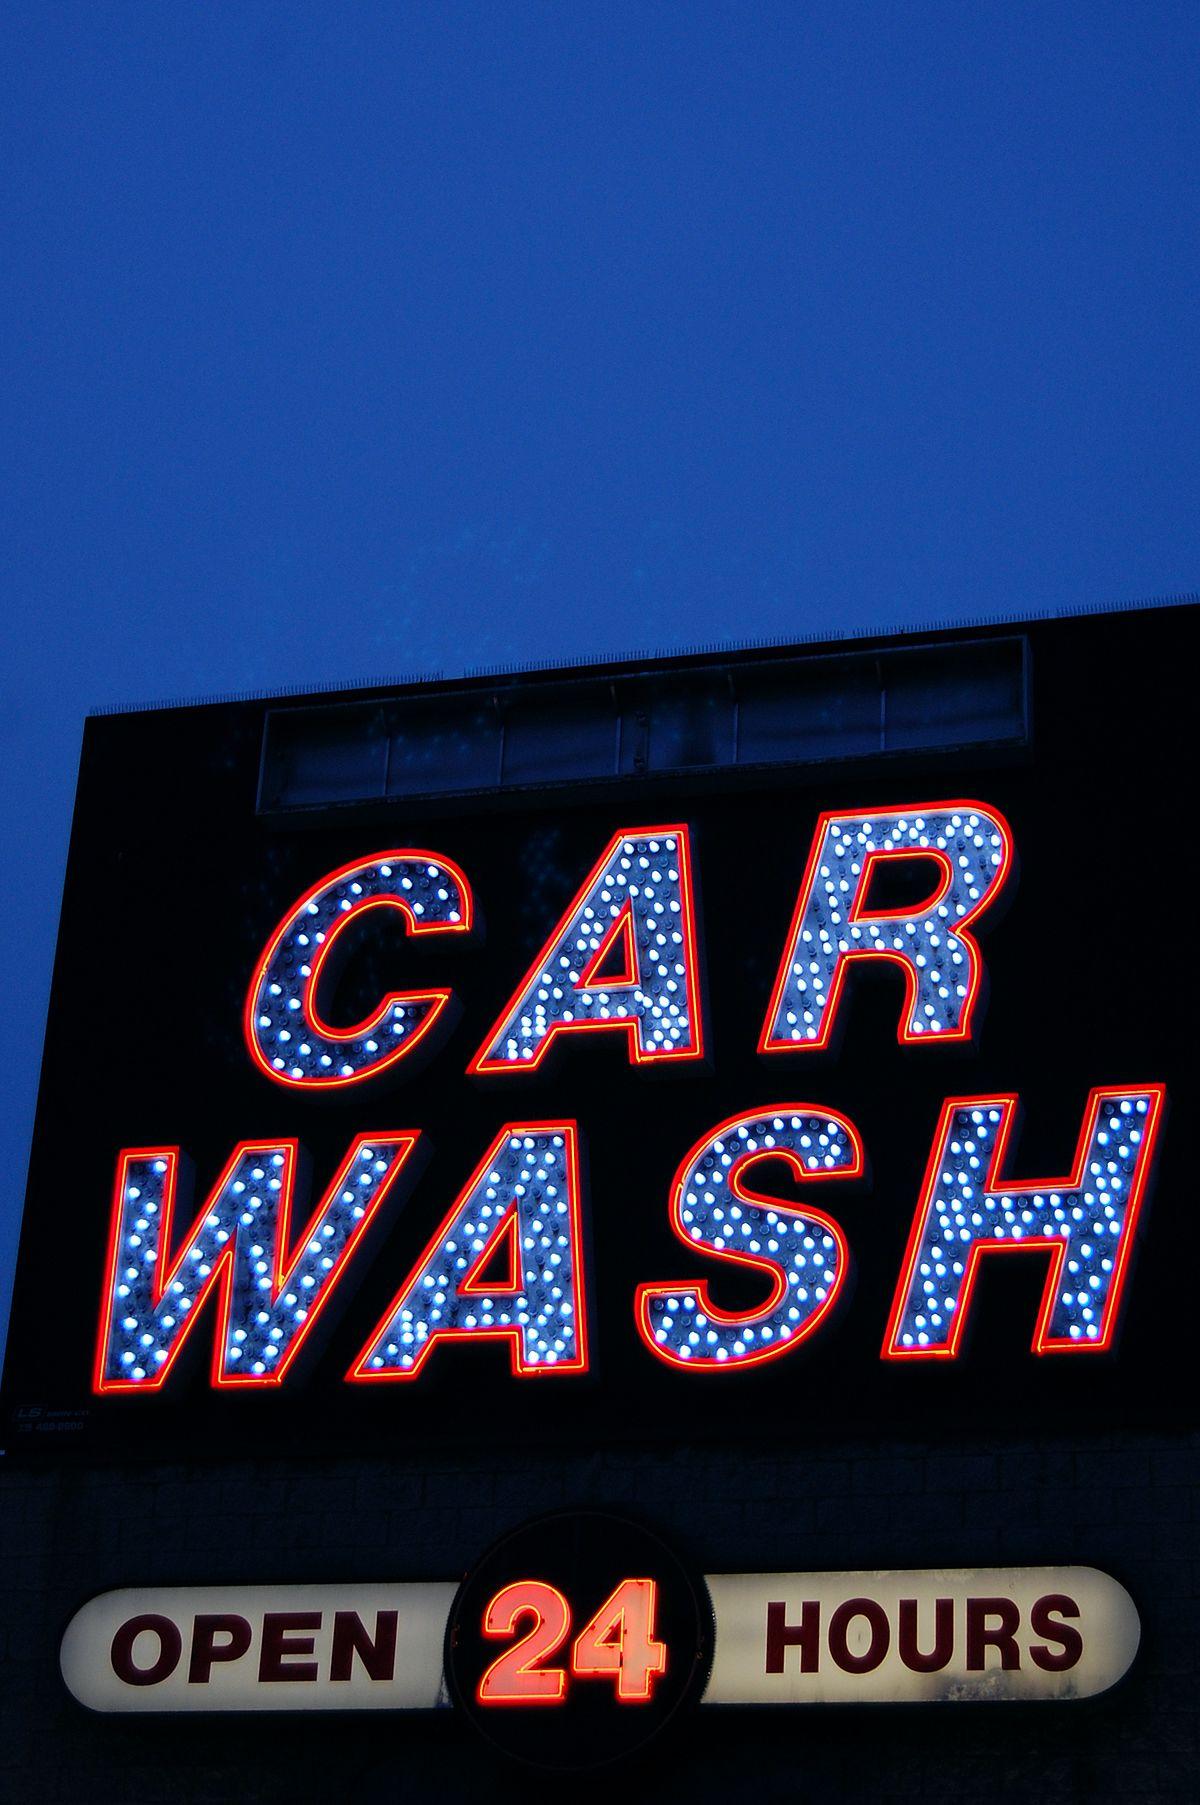 car wash wikiquote. Black Bedroom Furniture Sets. Home Design Ideas